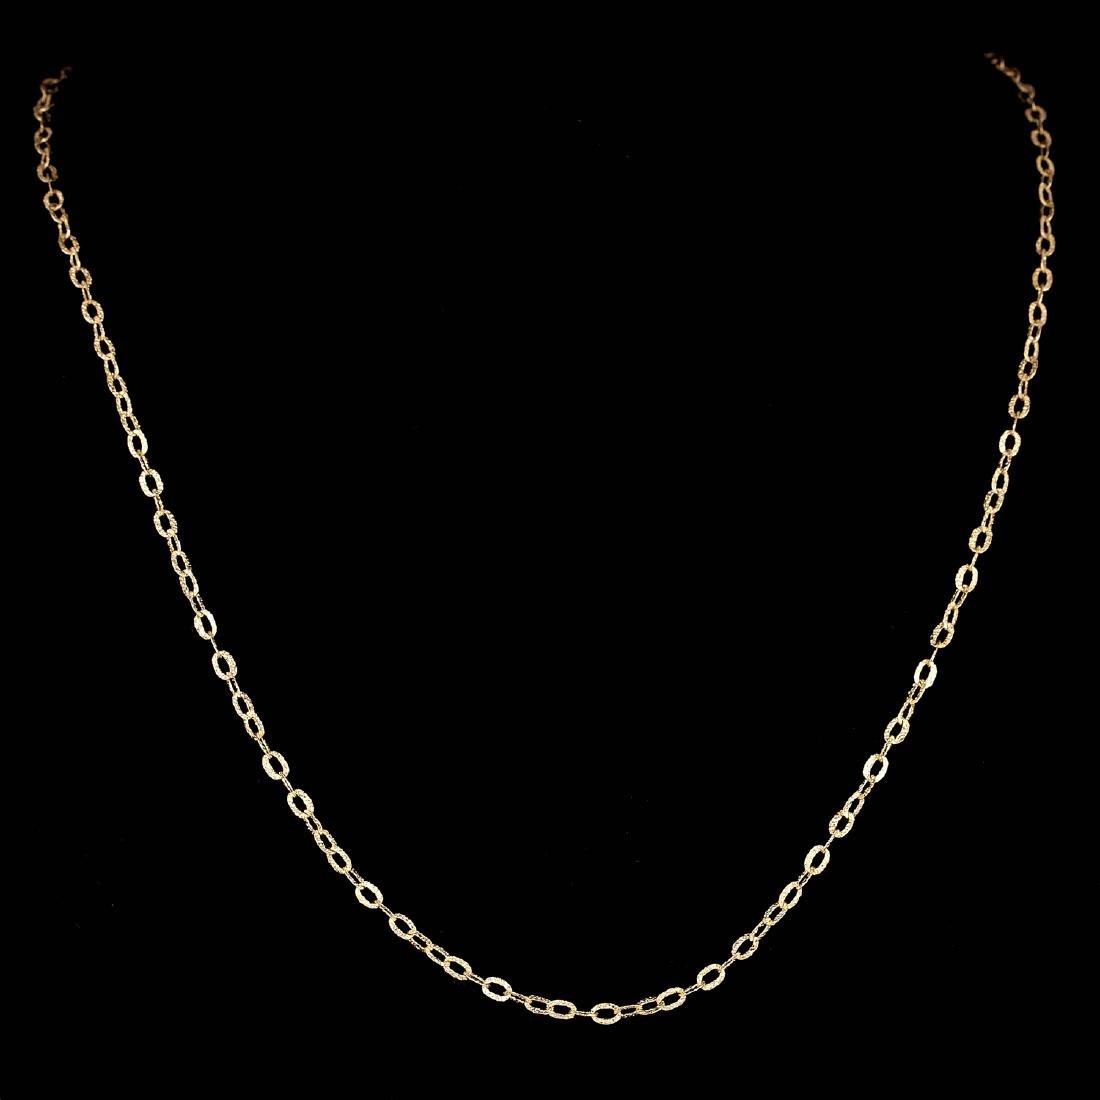 *Fine Jewelry 14KT Gold, 2.0GR, 18'' Corrugated Oval